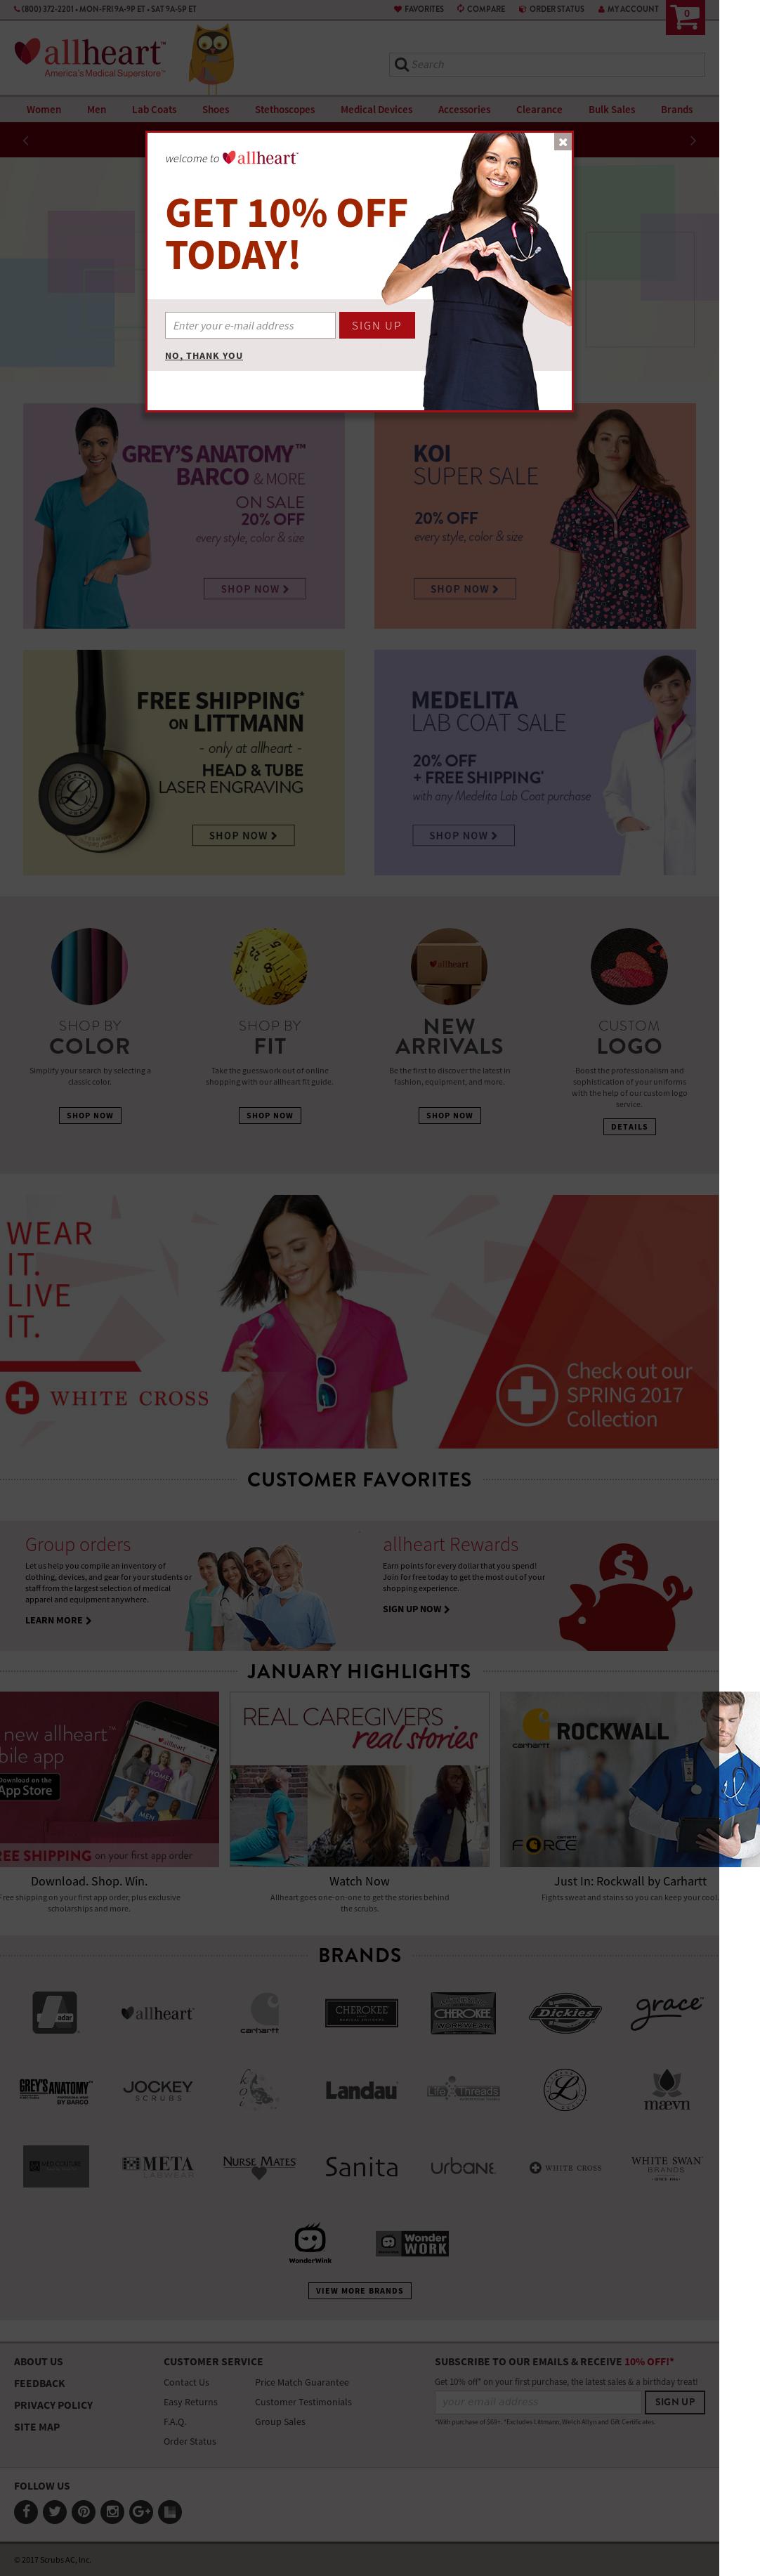 c16389f2719 AllHeart Competitors, Revenue and Employees - Owler Company Profile